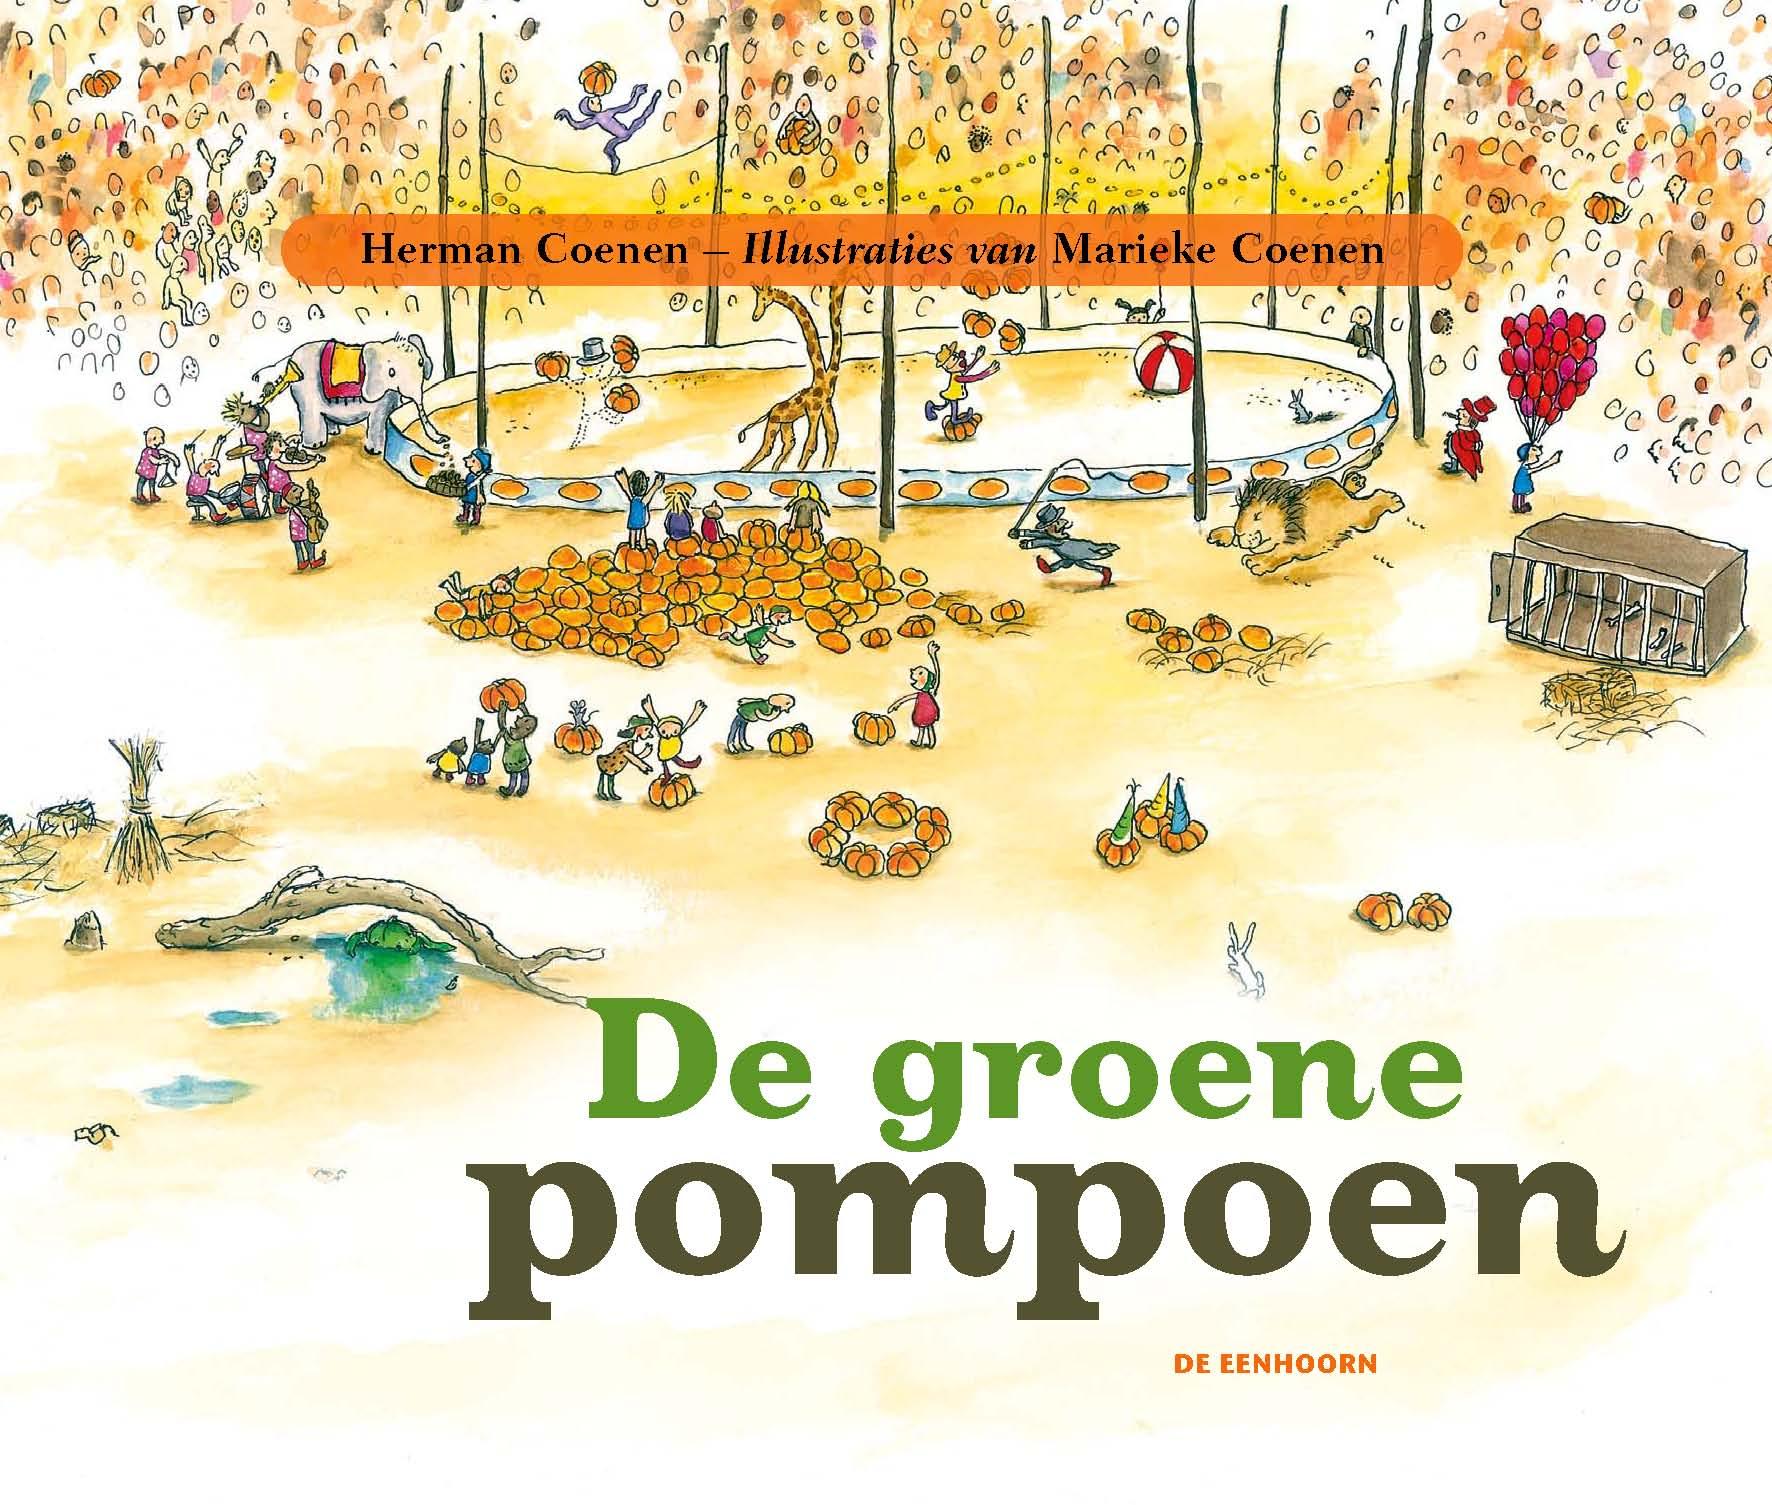 degroenepompoen1